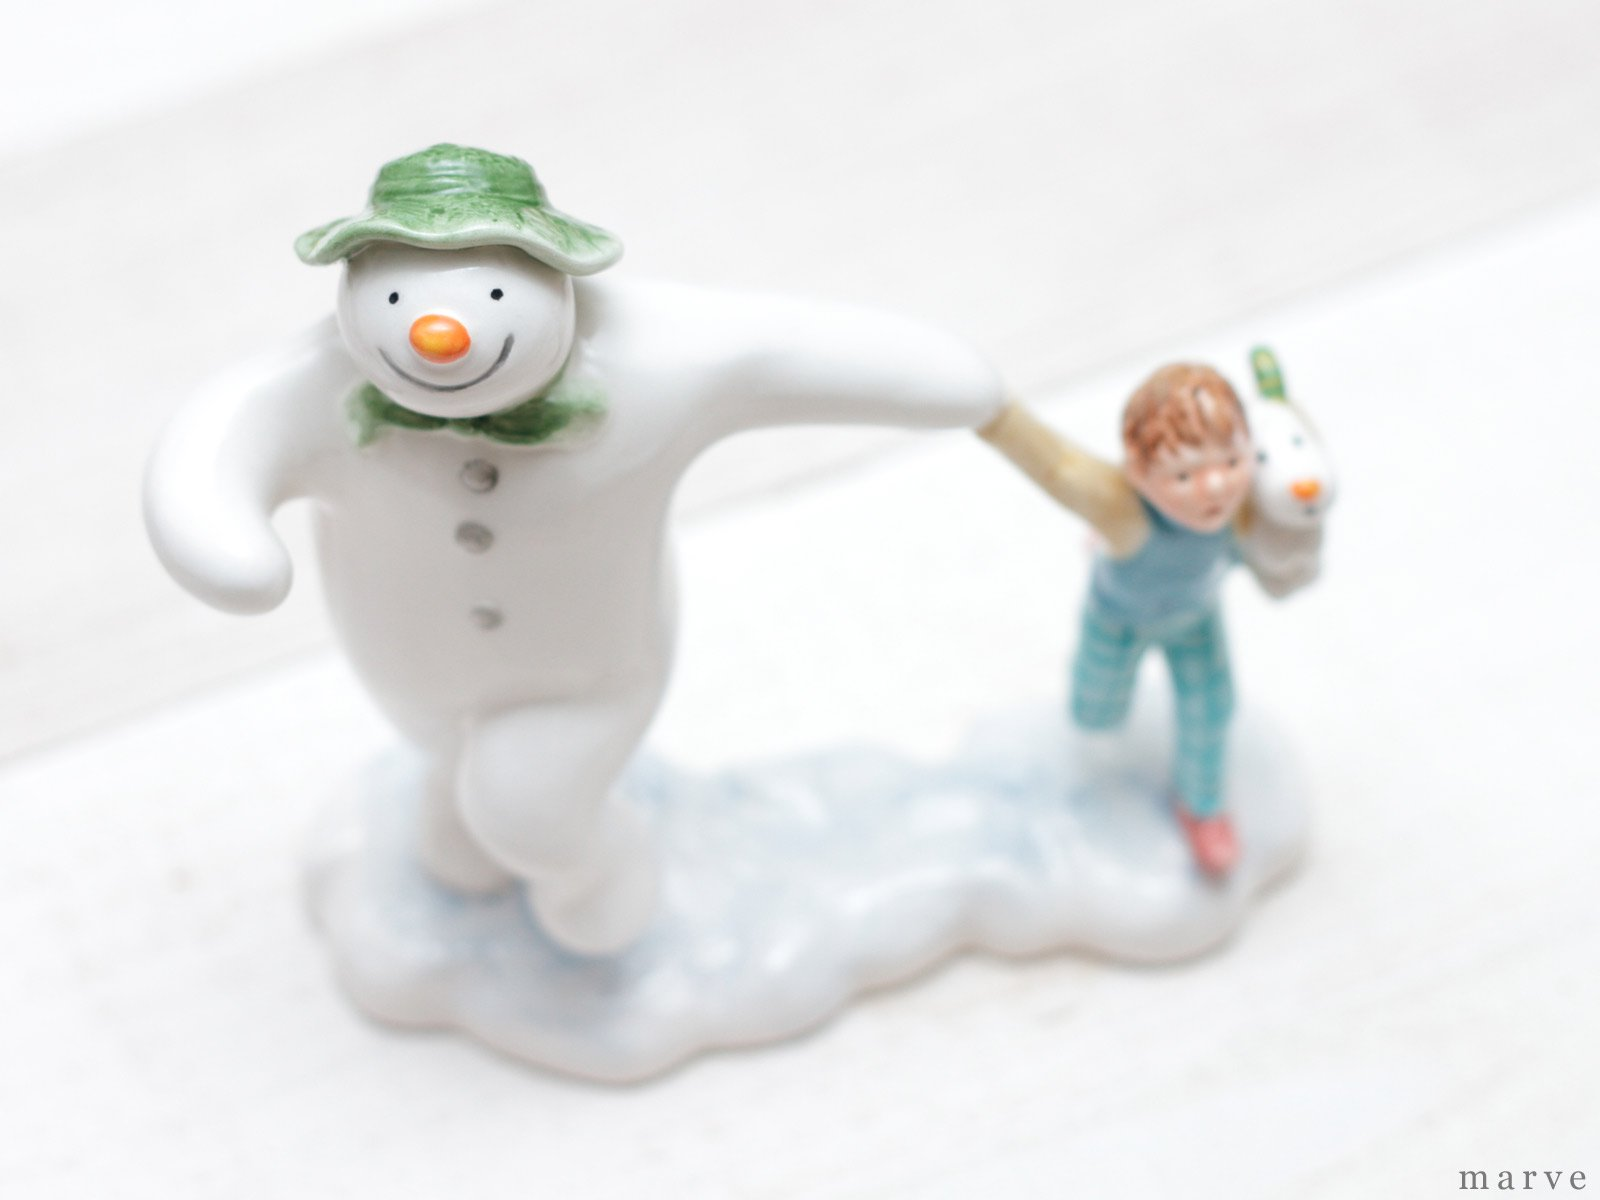 The Snowman フィギュリン テイクオフ